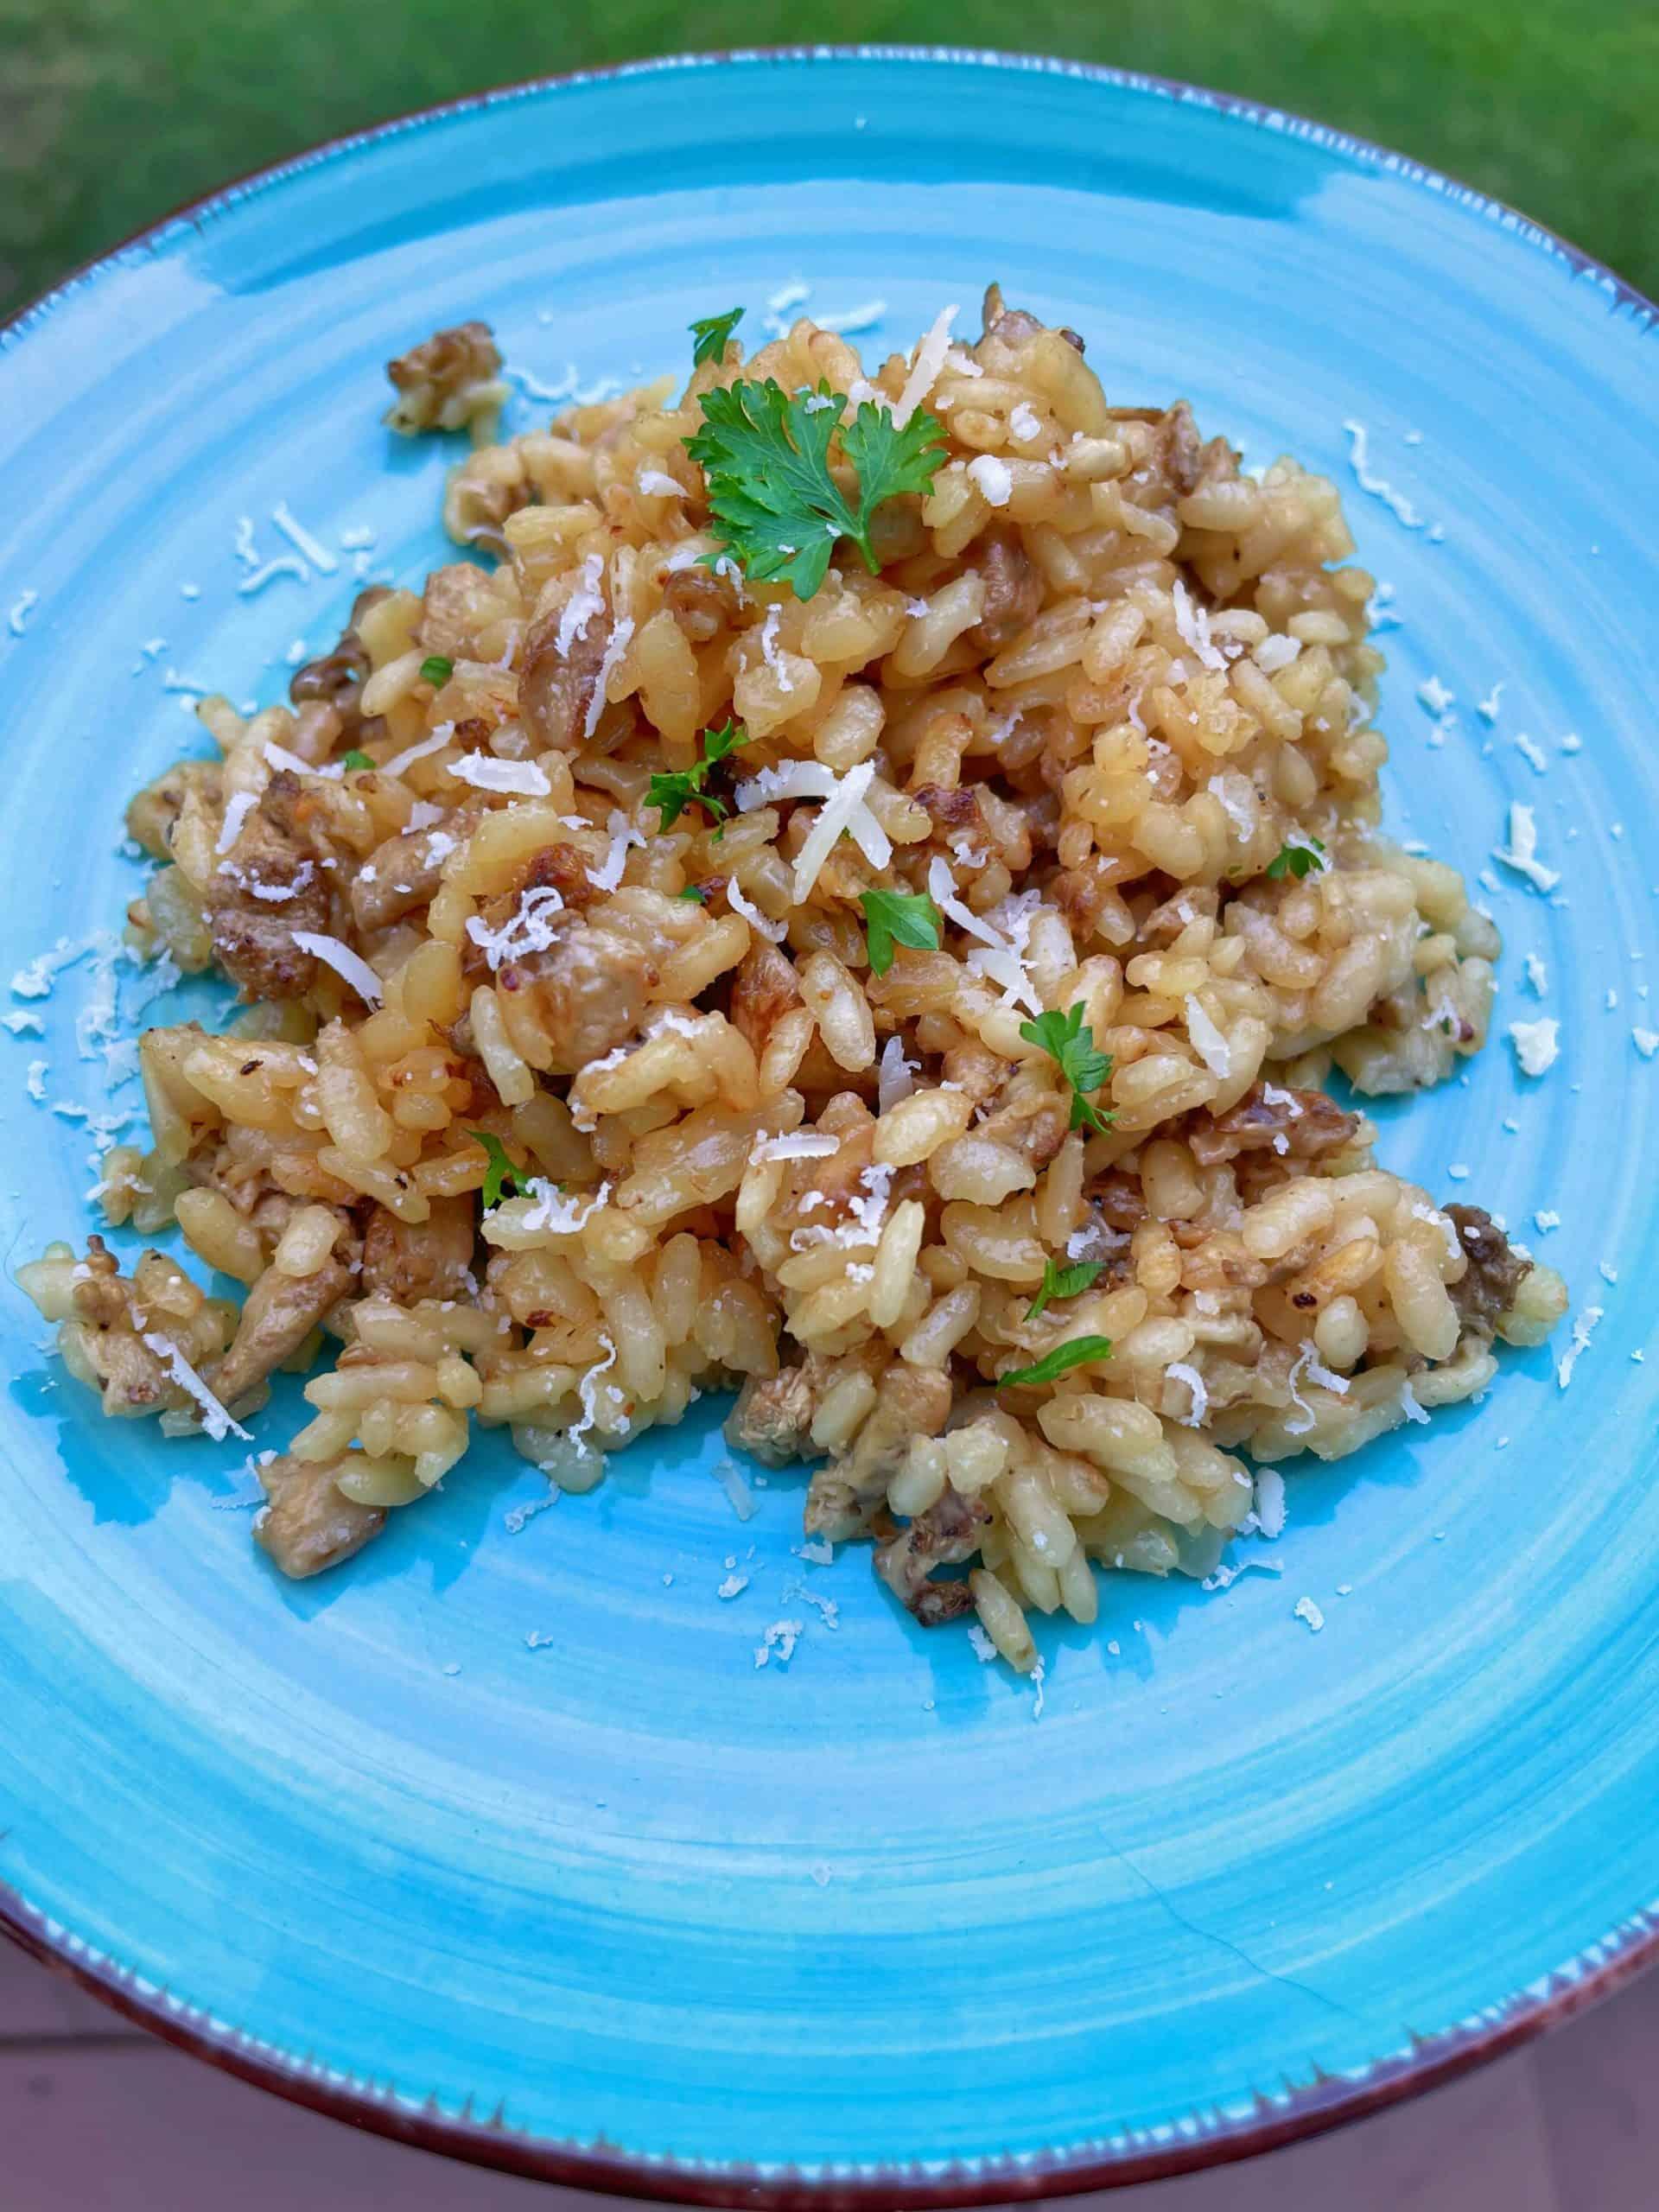 Mushroom Parmesan Risotto on a plate.